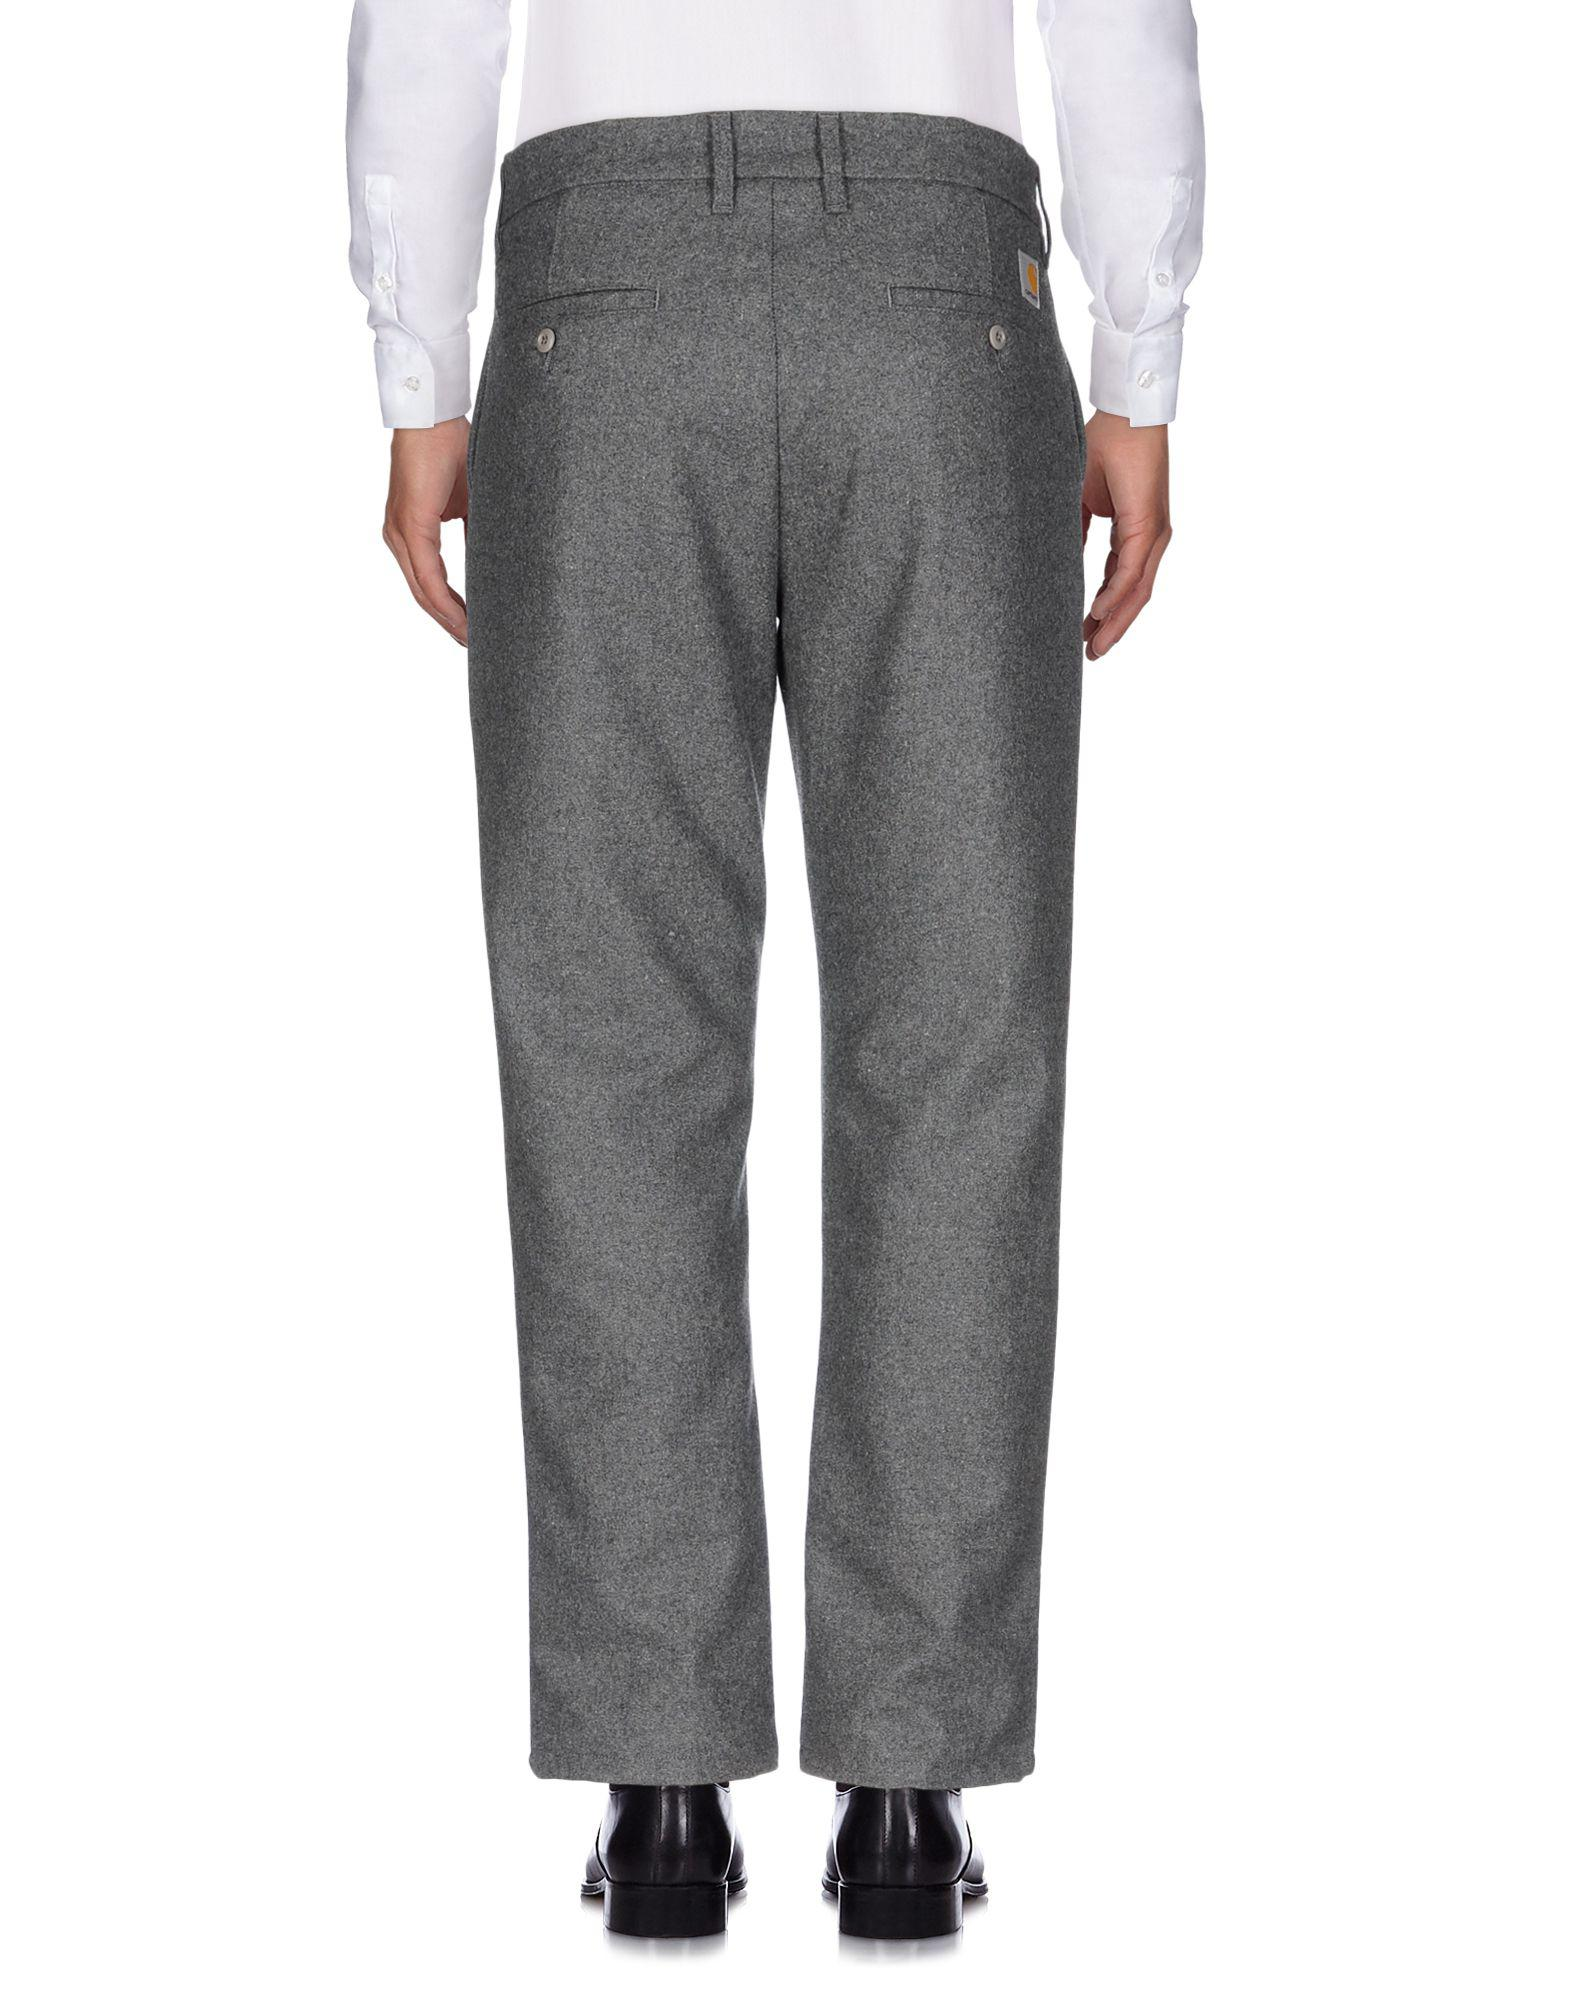 Carhartt Flannel Casual Pants in Grey (Grey) for Men